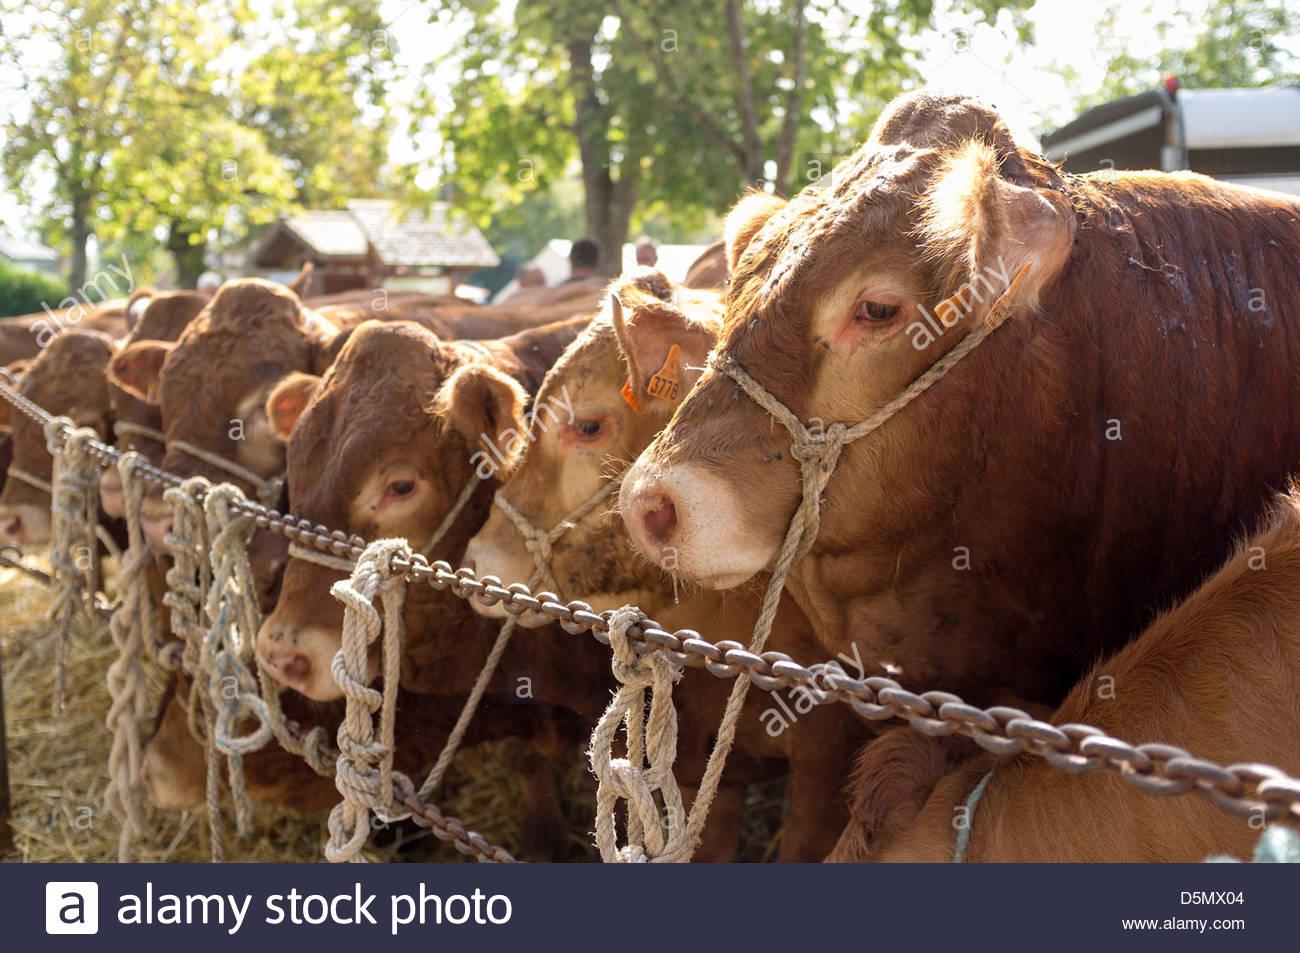 Limousine breed cattle at a agricultural market, Dun-le-Palastel, La Creuse, Limousin, France - Stock Image